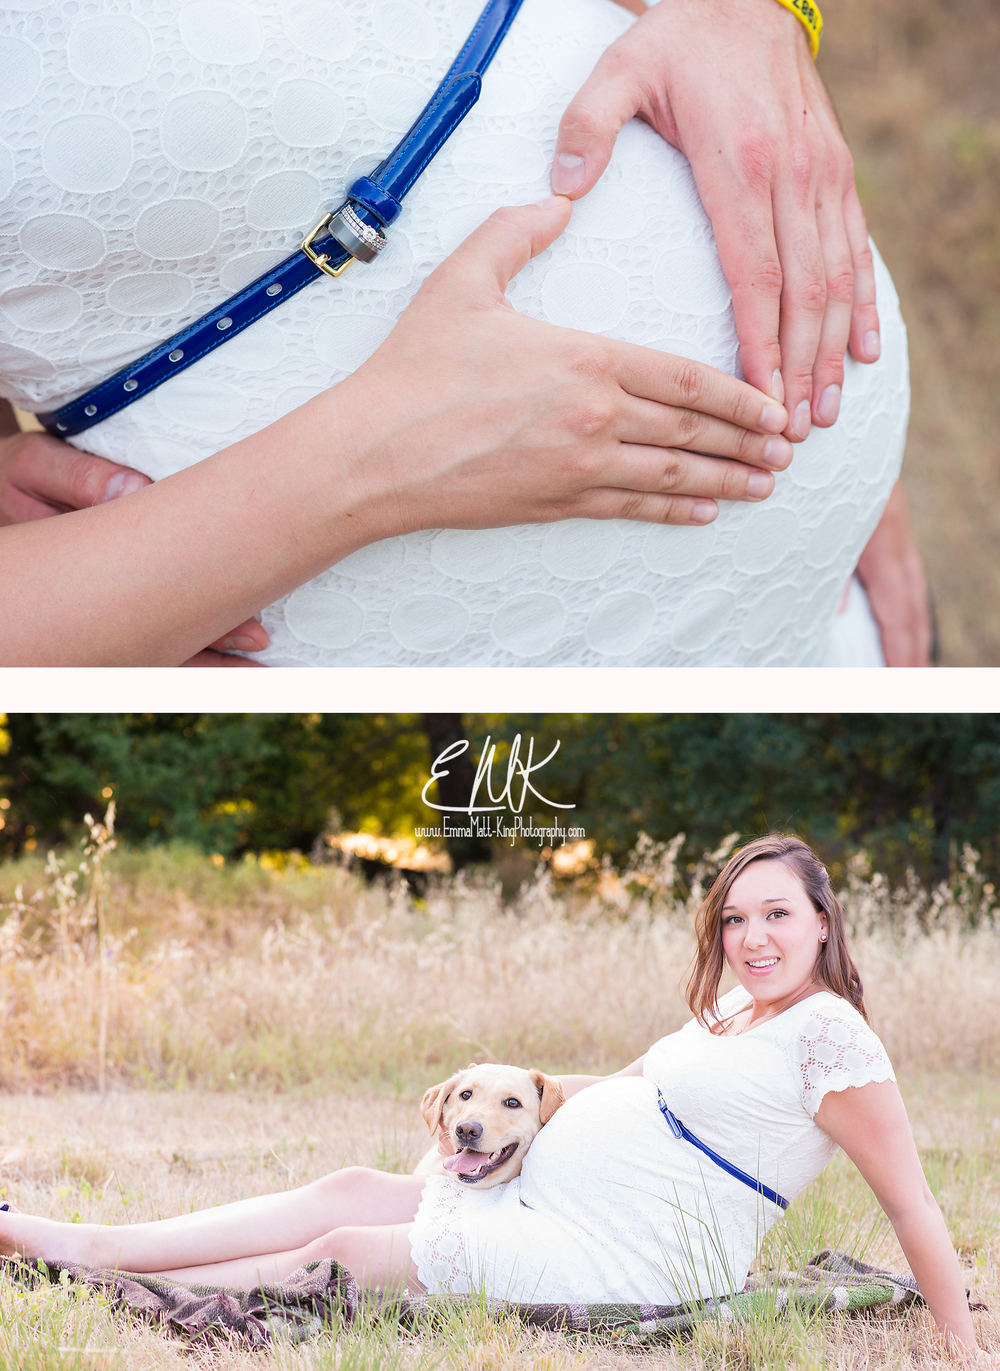 Maternitywm-9.jpg